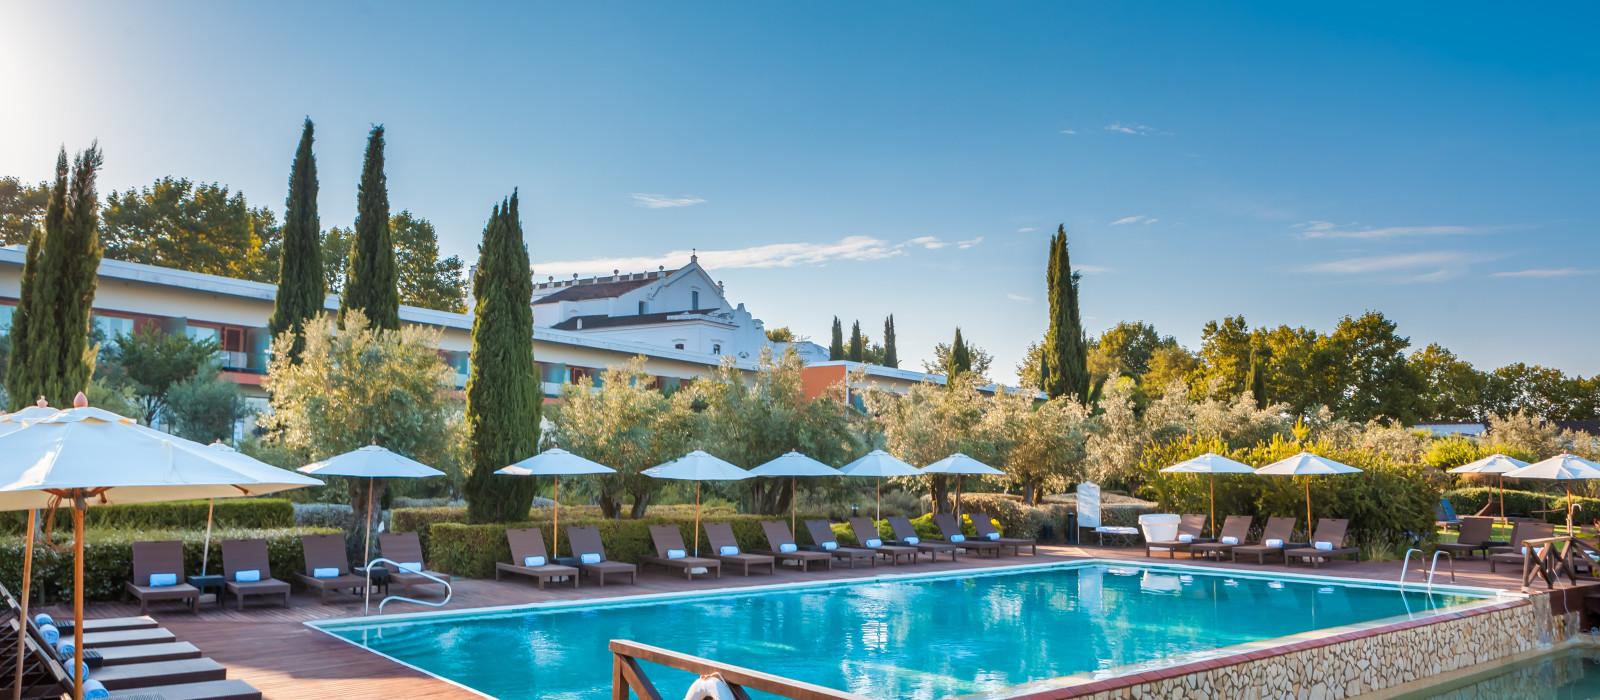 Hotel Convento do Espinheiro, Historic  & Spa Portugal